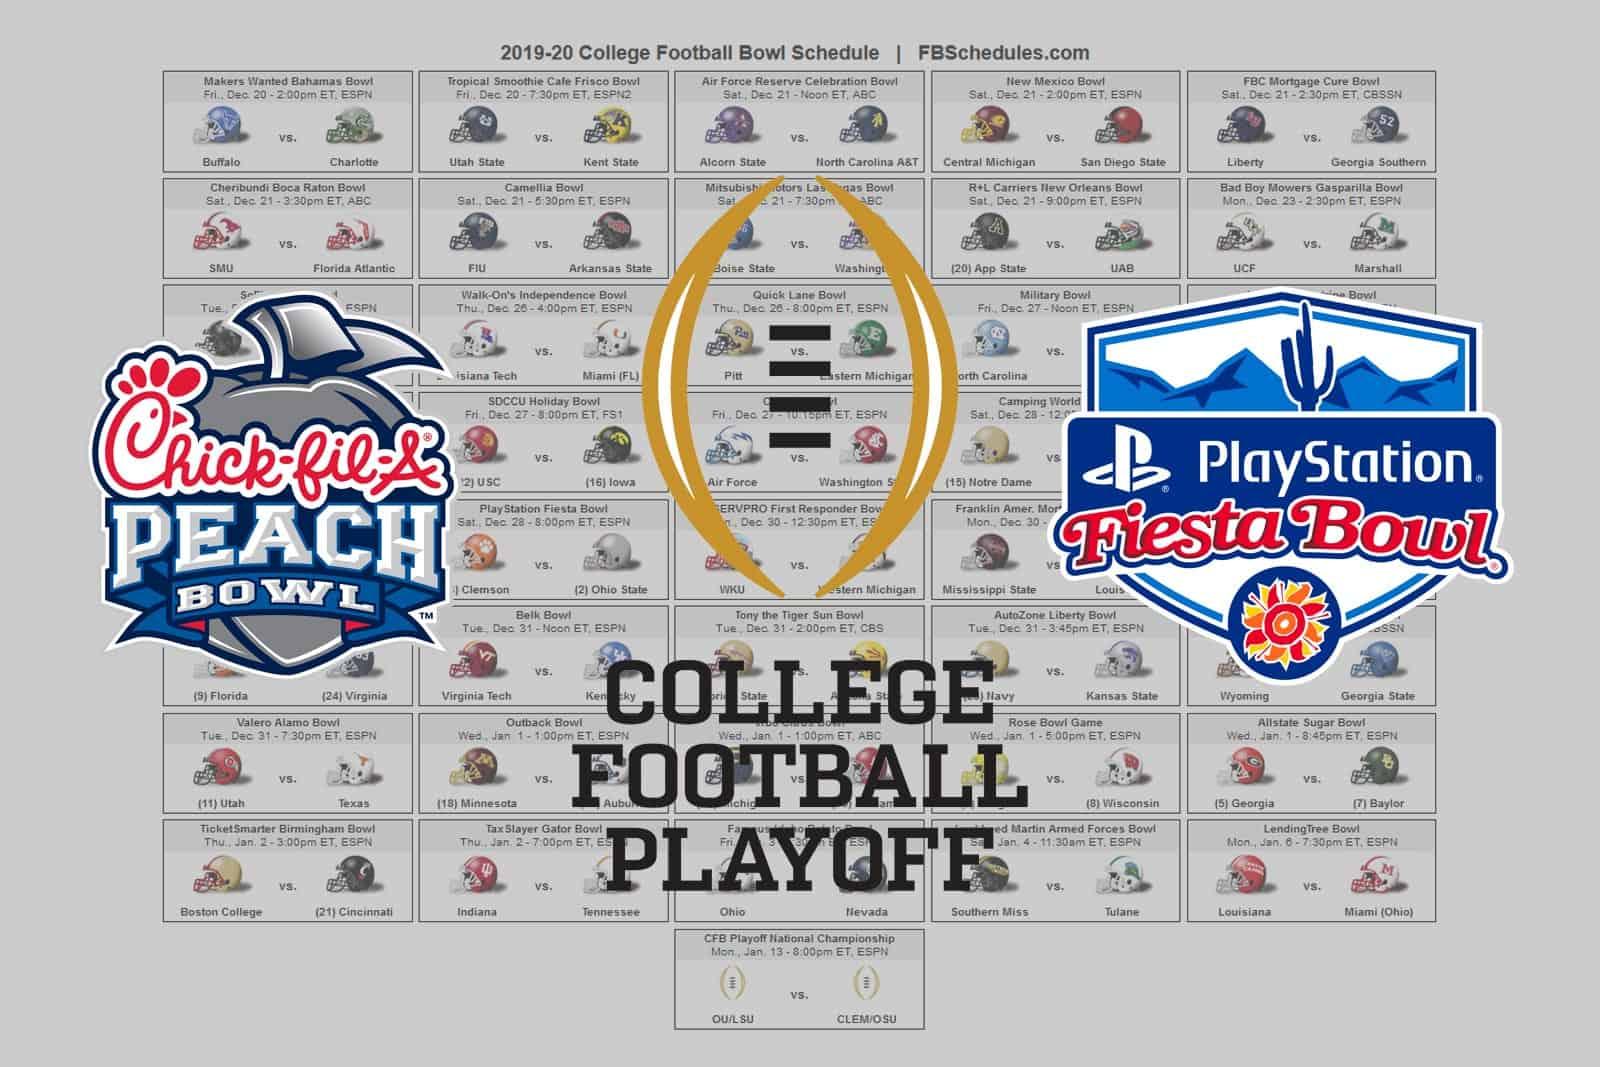 2019-20 College Football Bowl Helmet Schedule